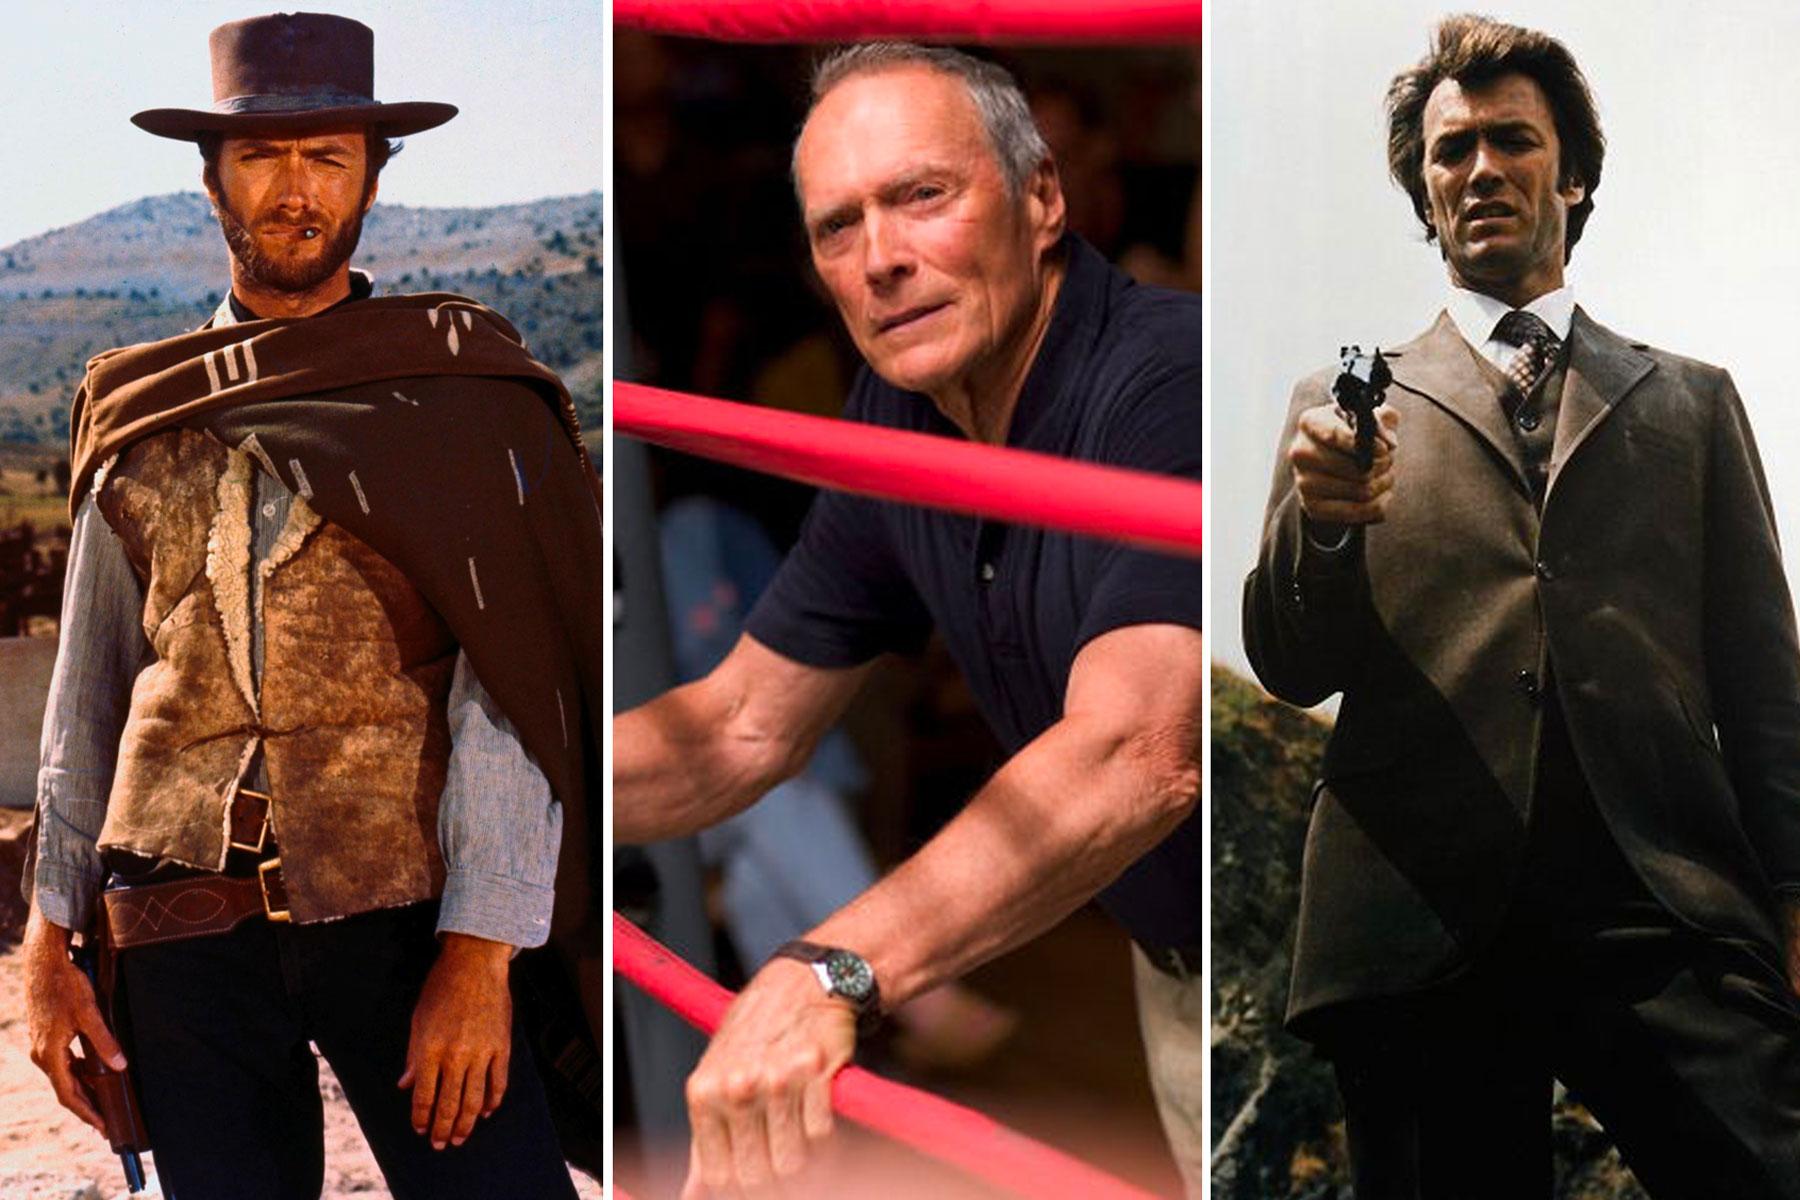 Clint Eastwood at 90: Part 2